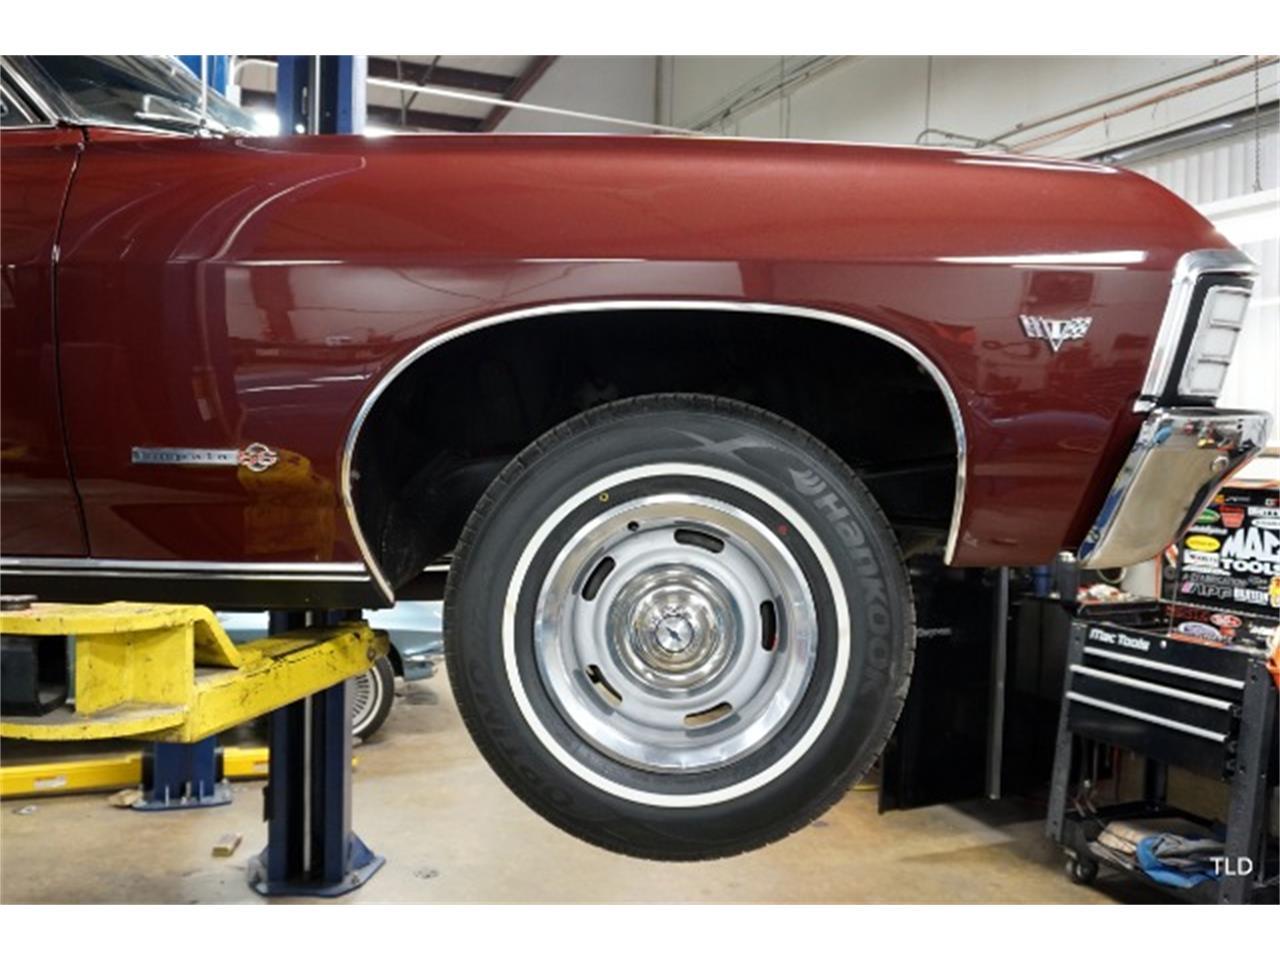 1967 Chevrolet Impala (CC-1172159) for sale in Chicago, Illinois